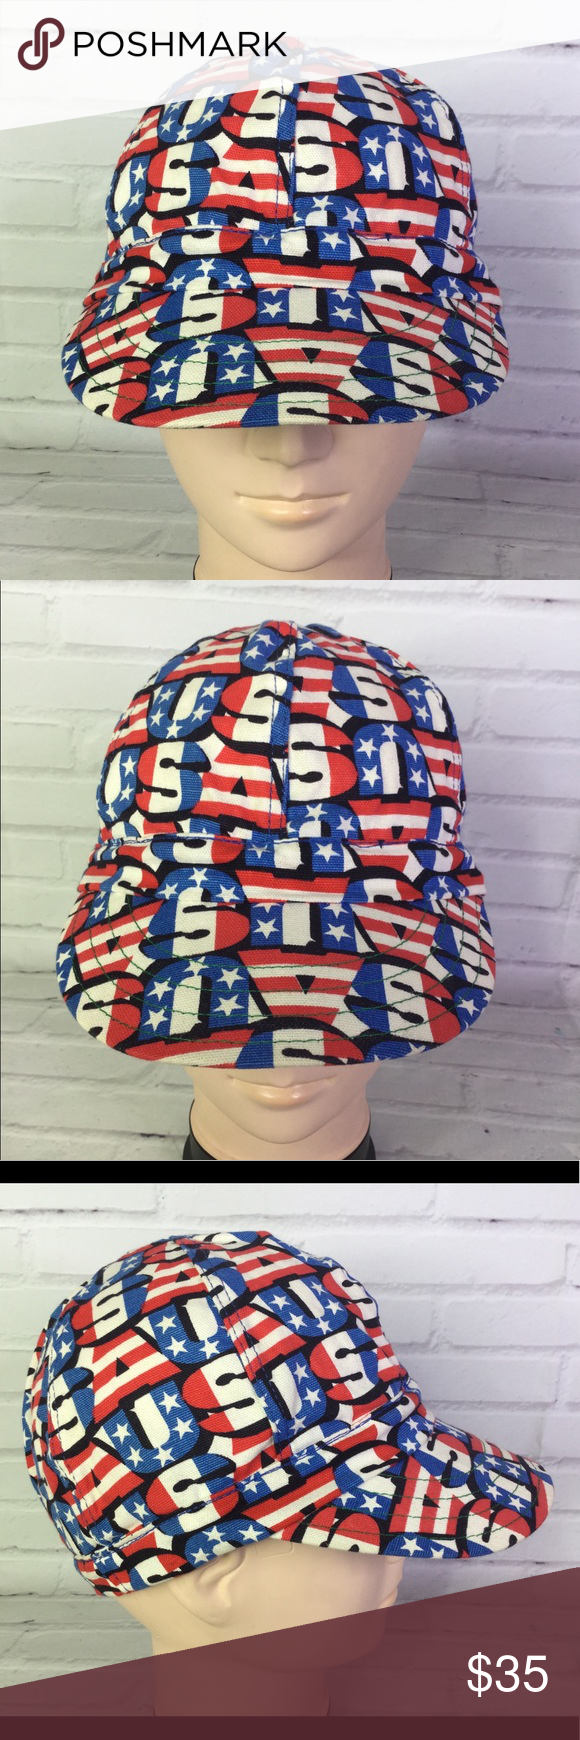 Vintage Kromer 7 3 8 Usa America All Over Print In 2020 Welding Hats Vintage Print